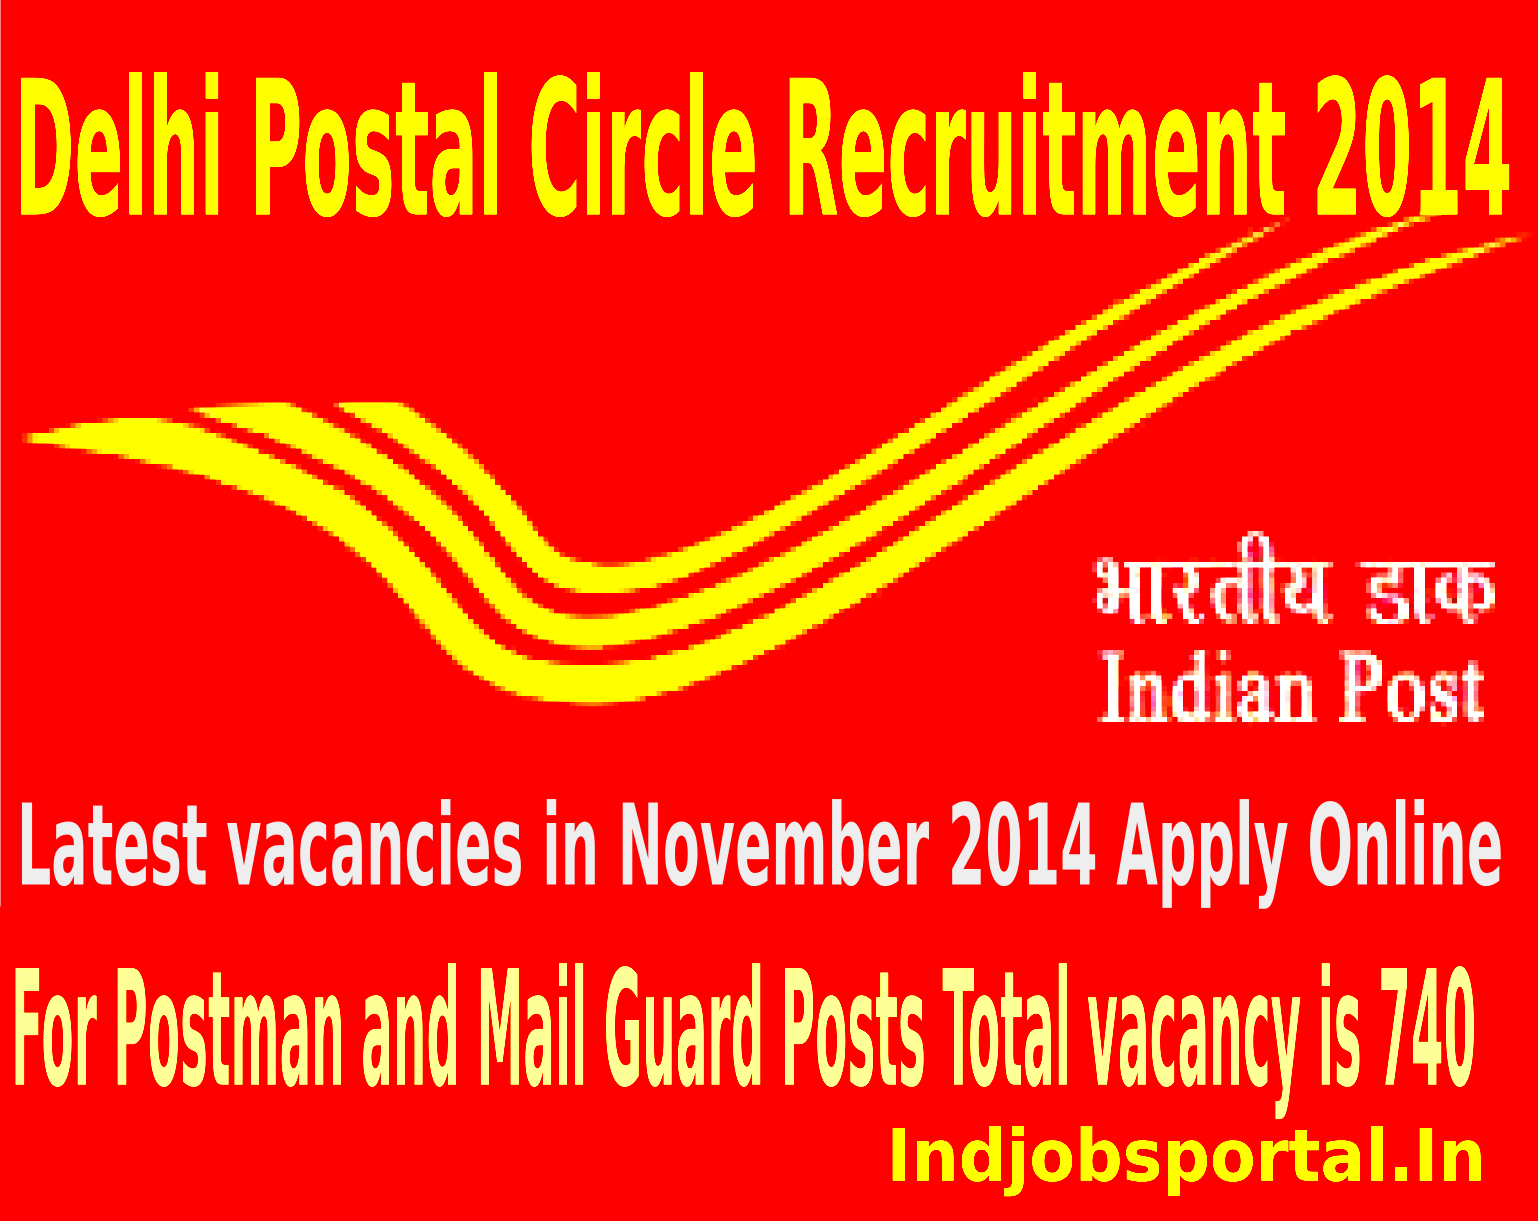 Delhi Postal Circle Recruitment 2014 for Postman and Mail Guard Posts.Delhi Postal Circle Recruitment 2014 for Postman and Mail Guard Posts.